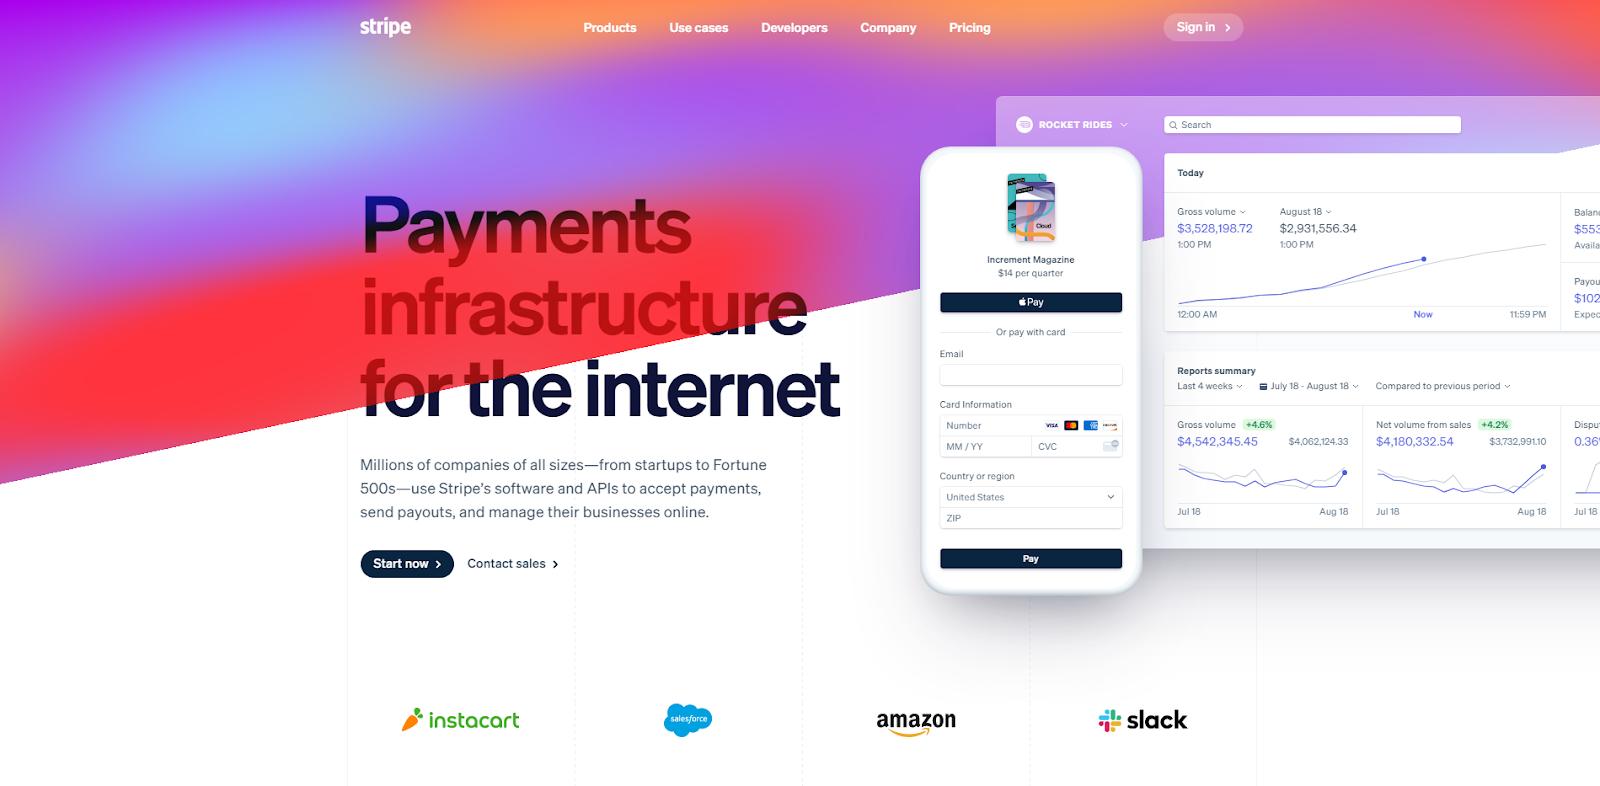 stripe.com home page